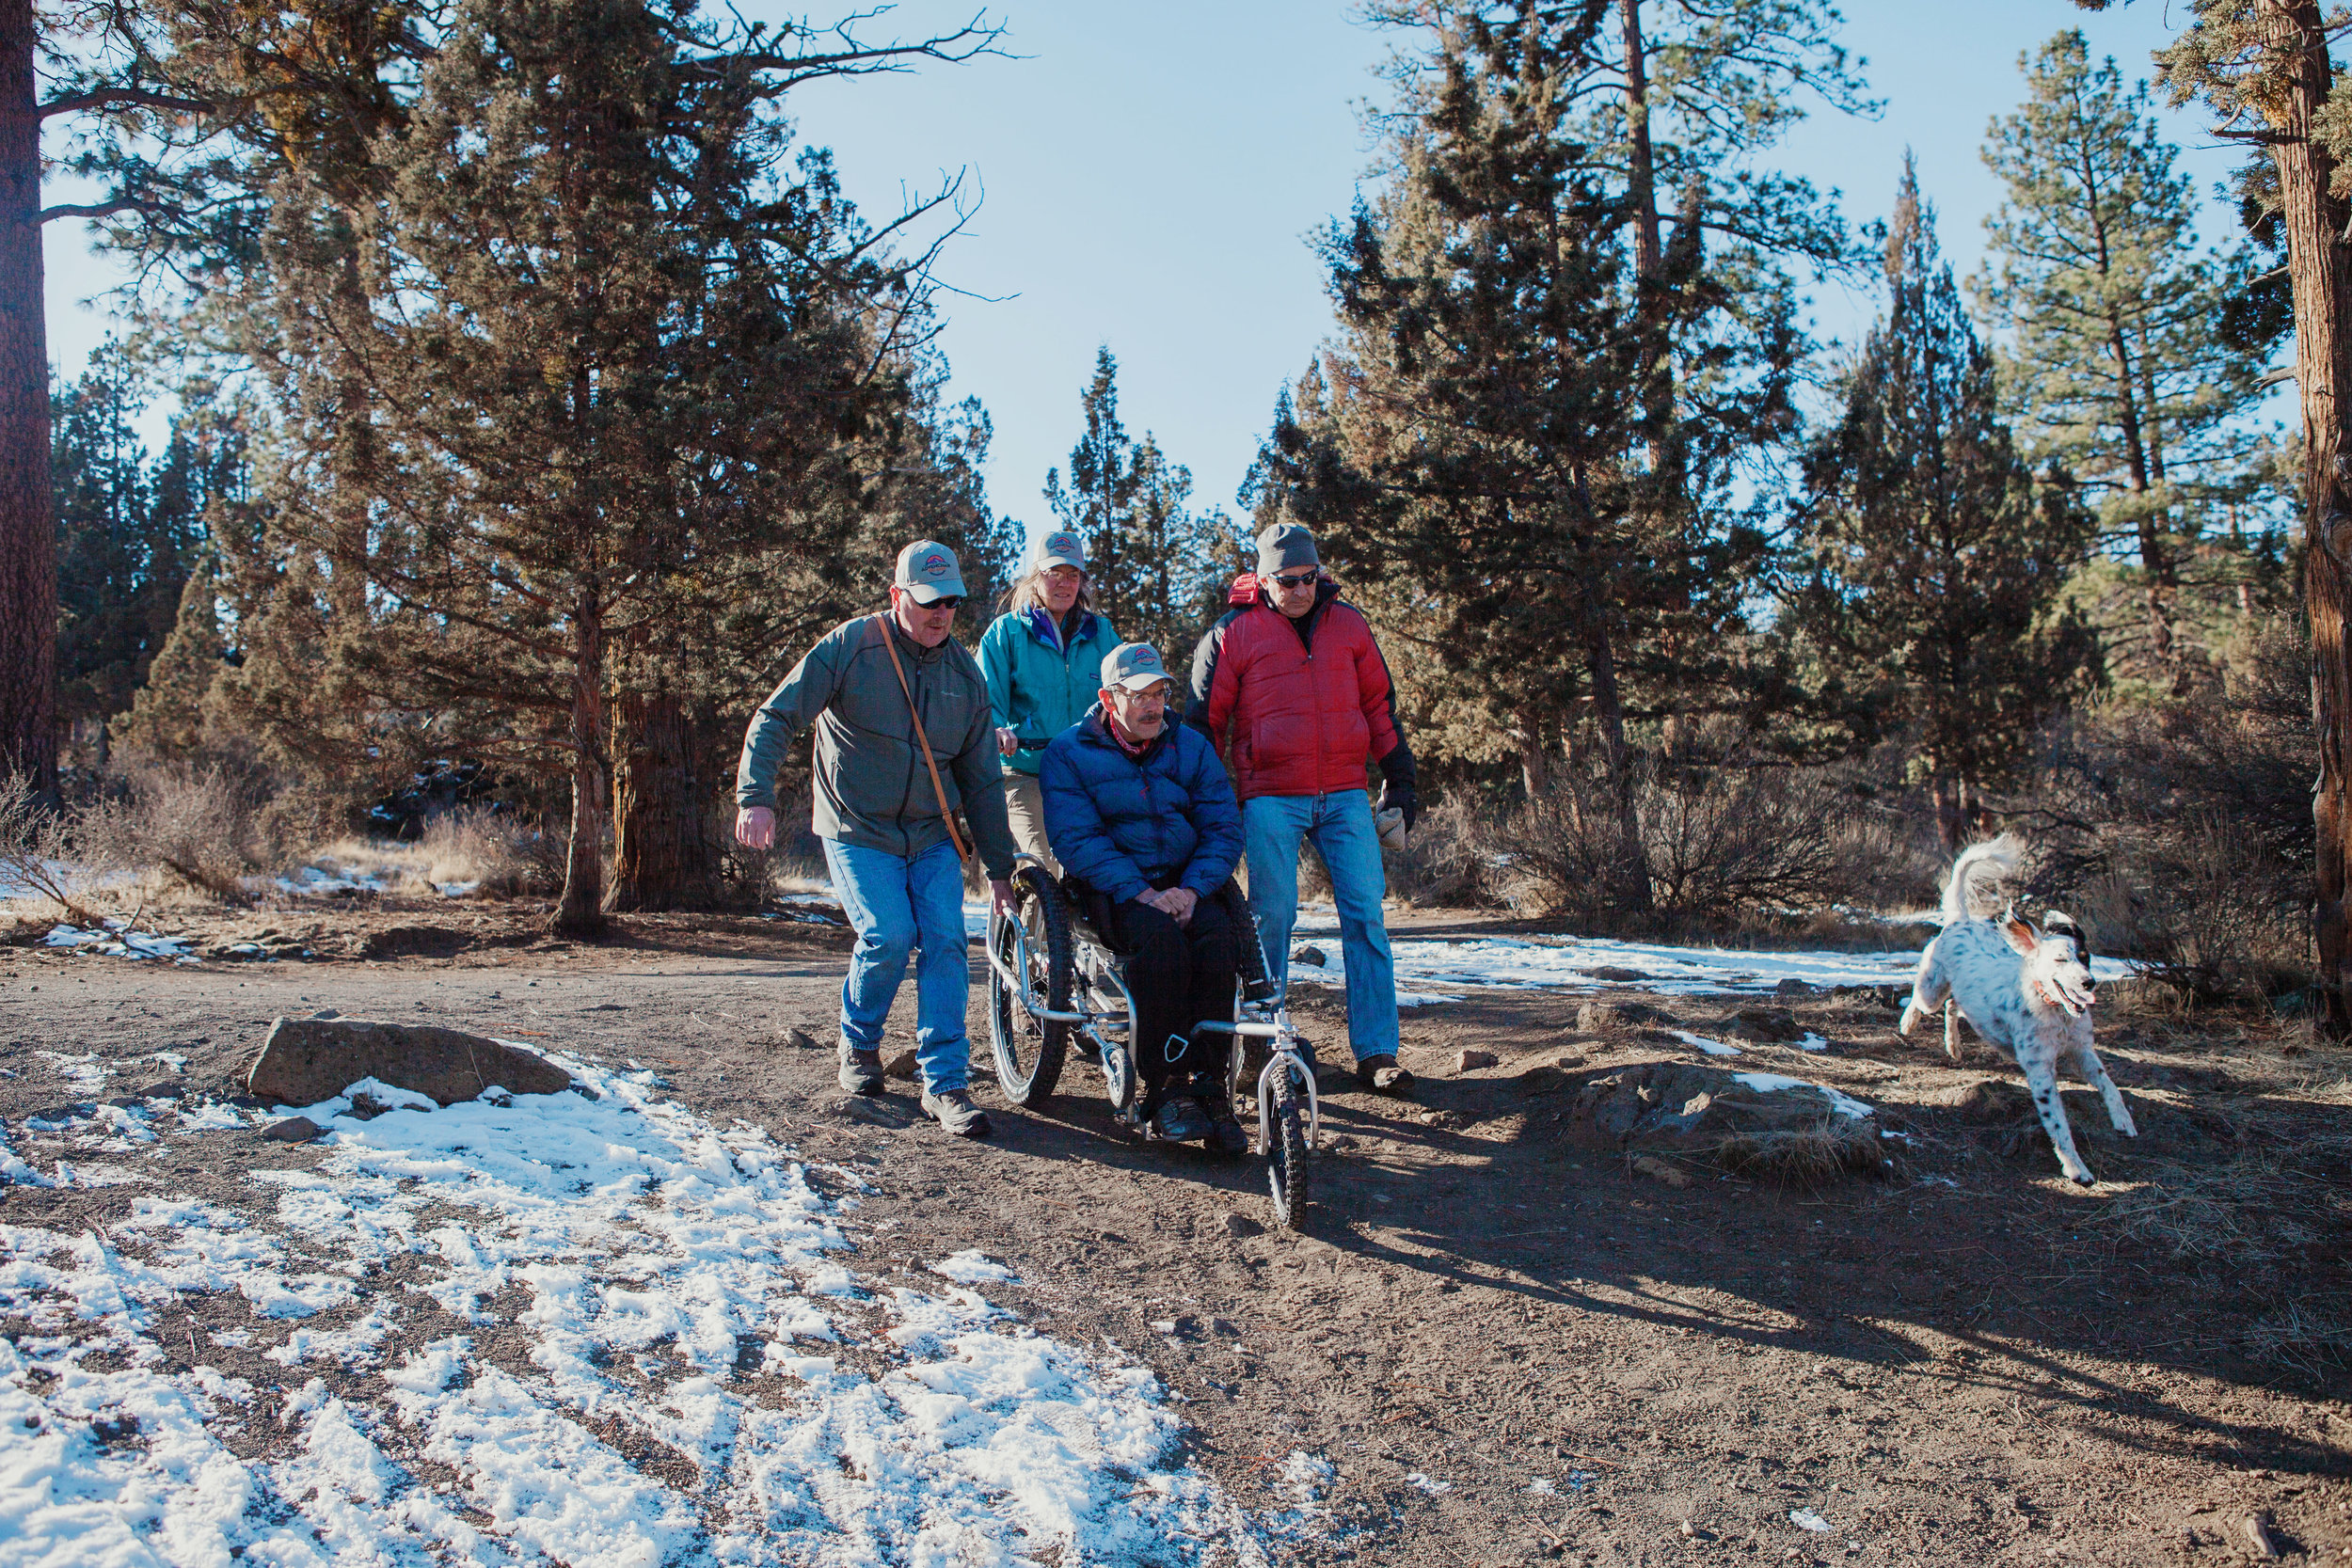 AdvenChair-offroad-wheelchair-Bend-Oregon-068.jpg